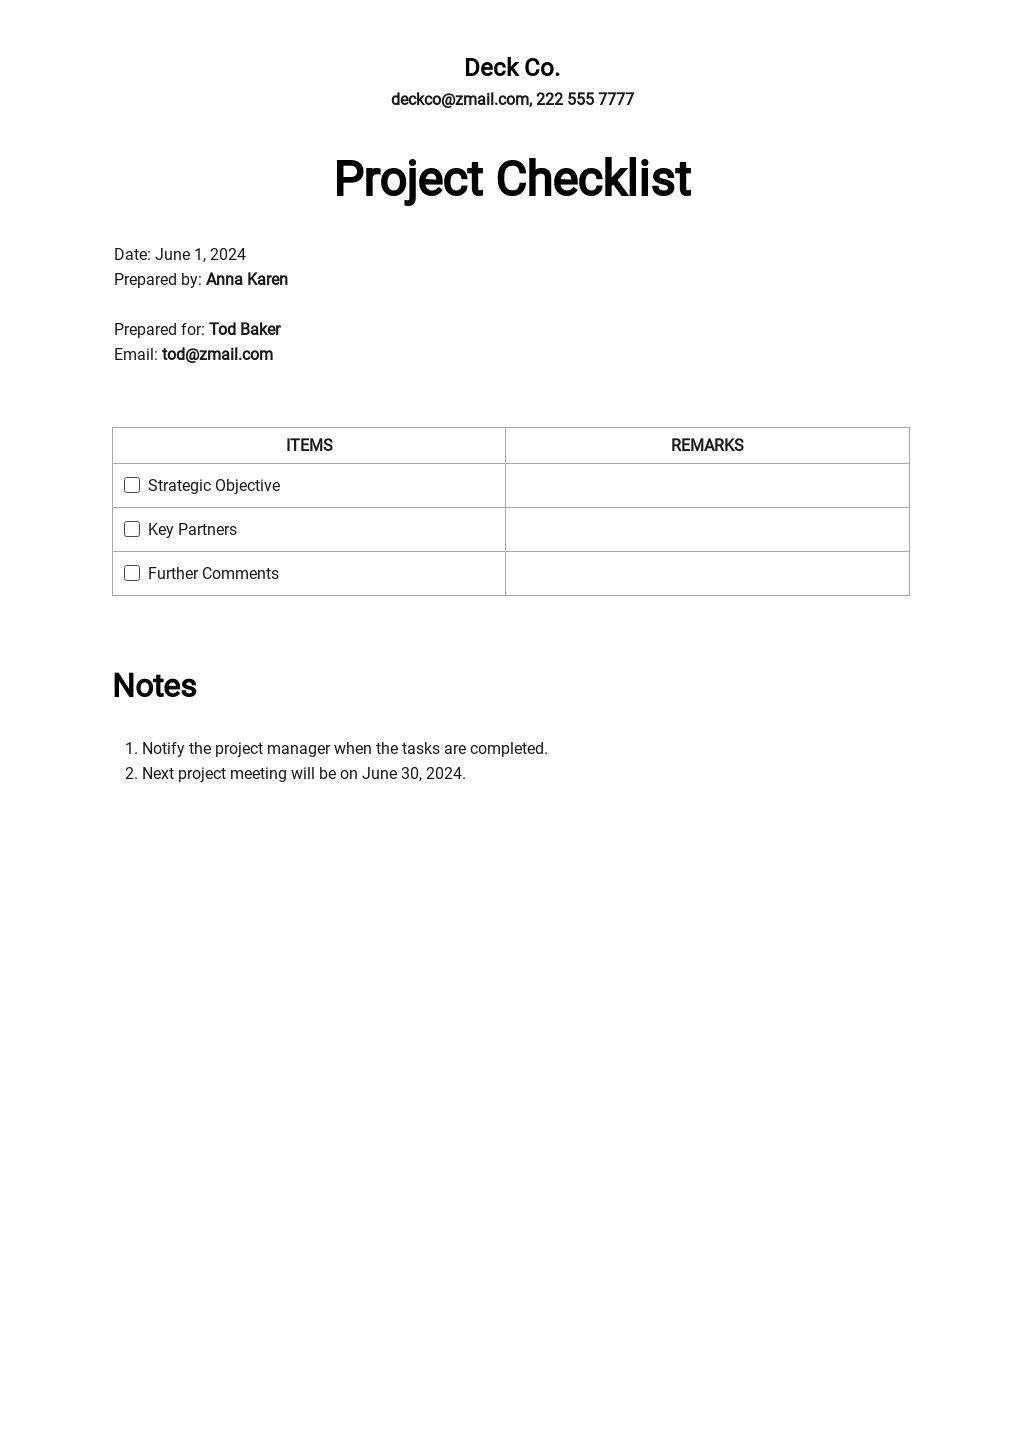 Free Project Checklist Template.jpe